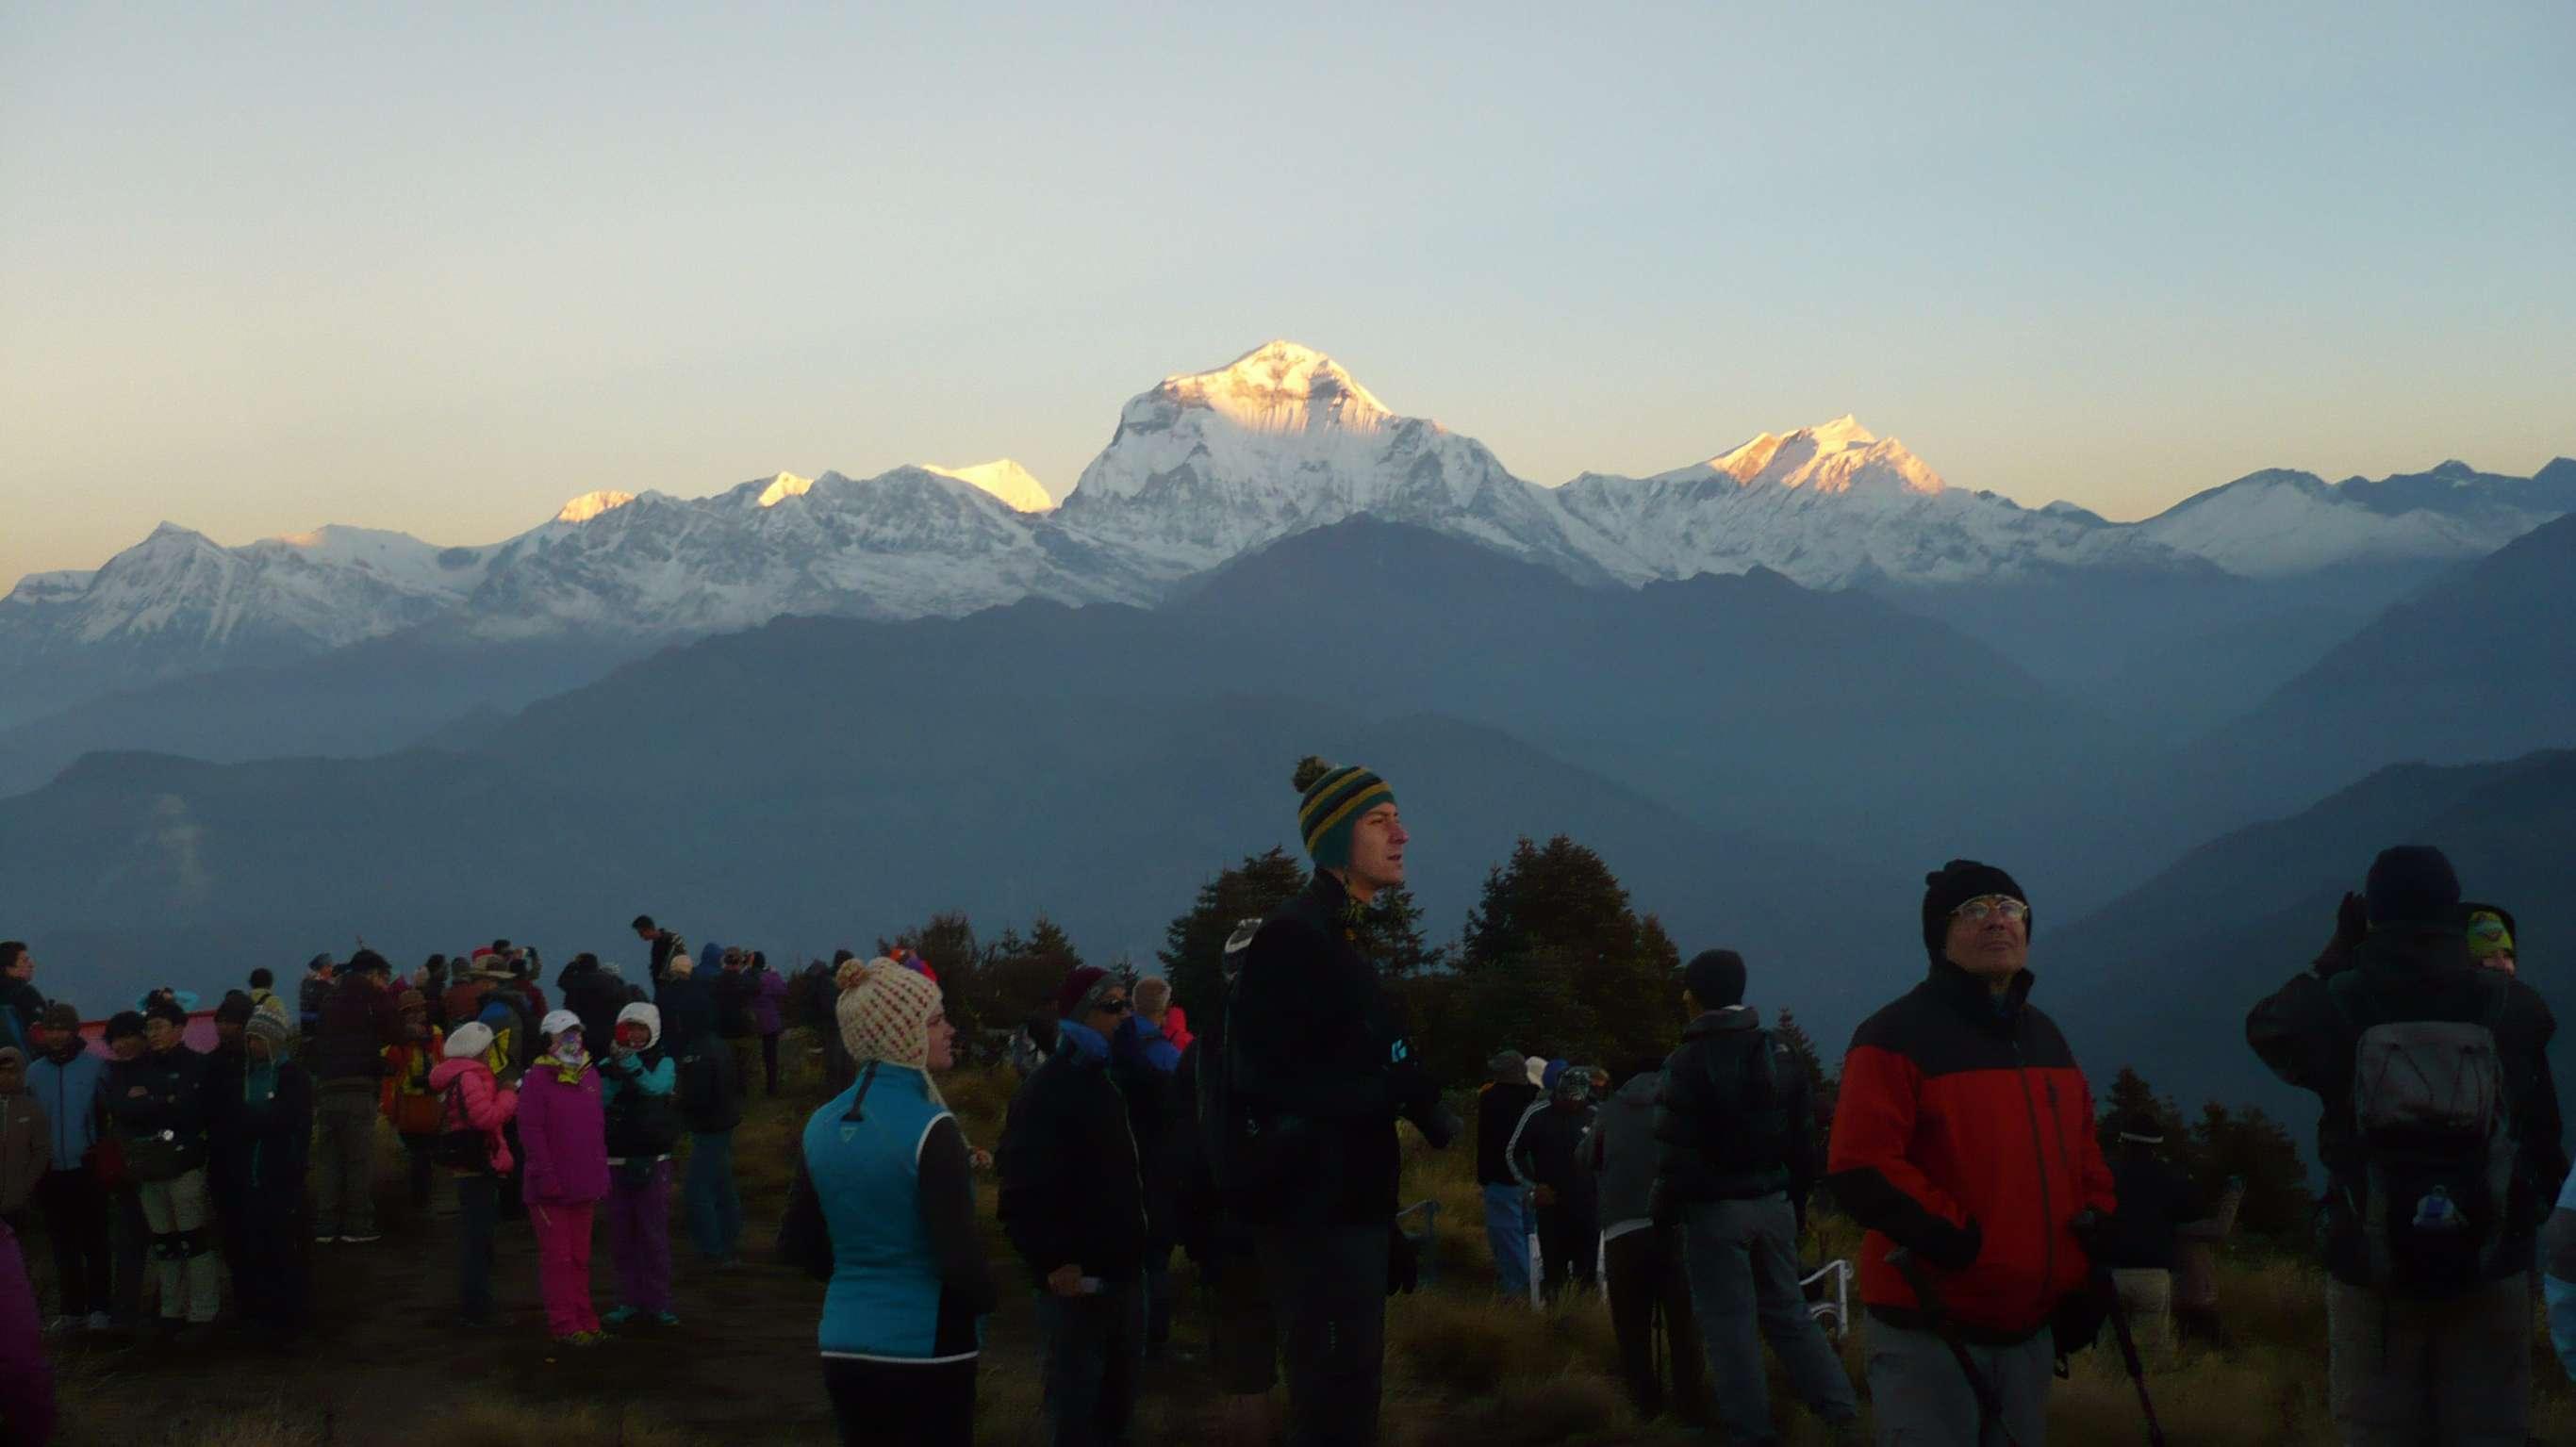 10-Day Poonhill Trek & Kathmandu Trip - Nepal Itinerary